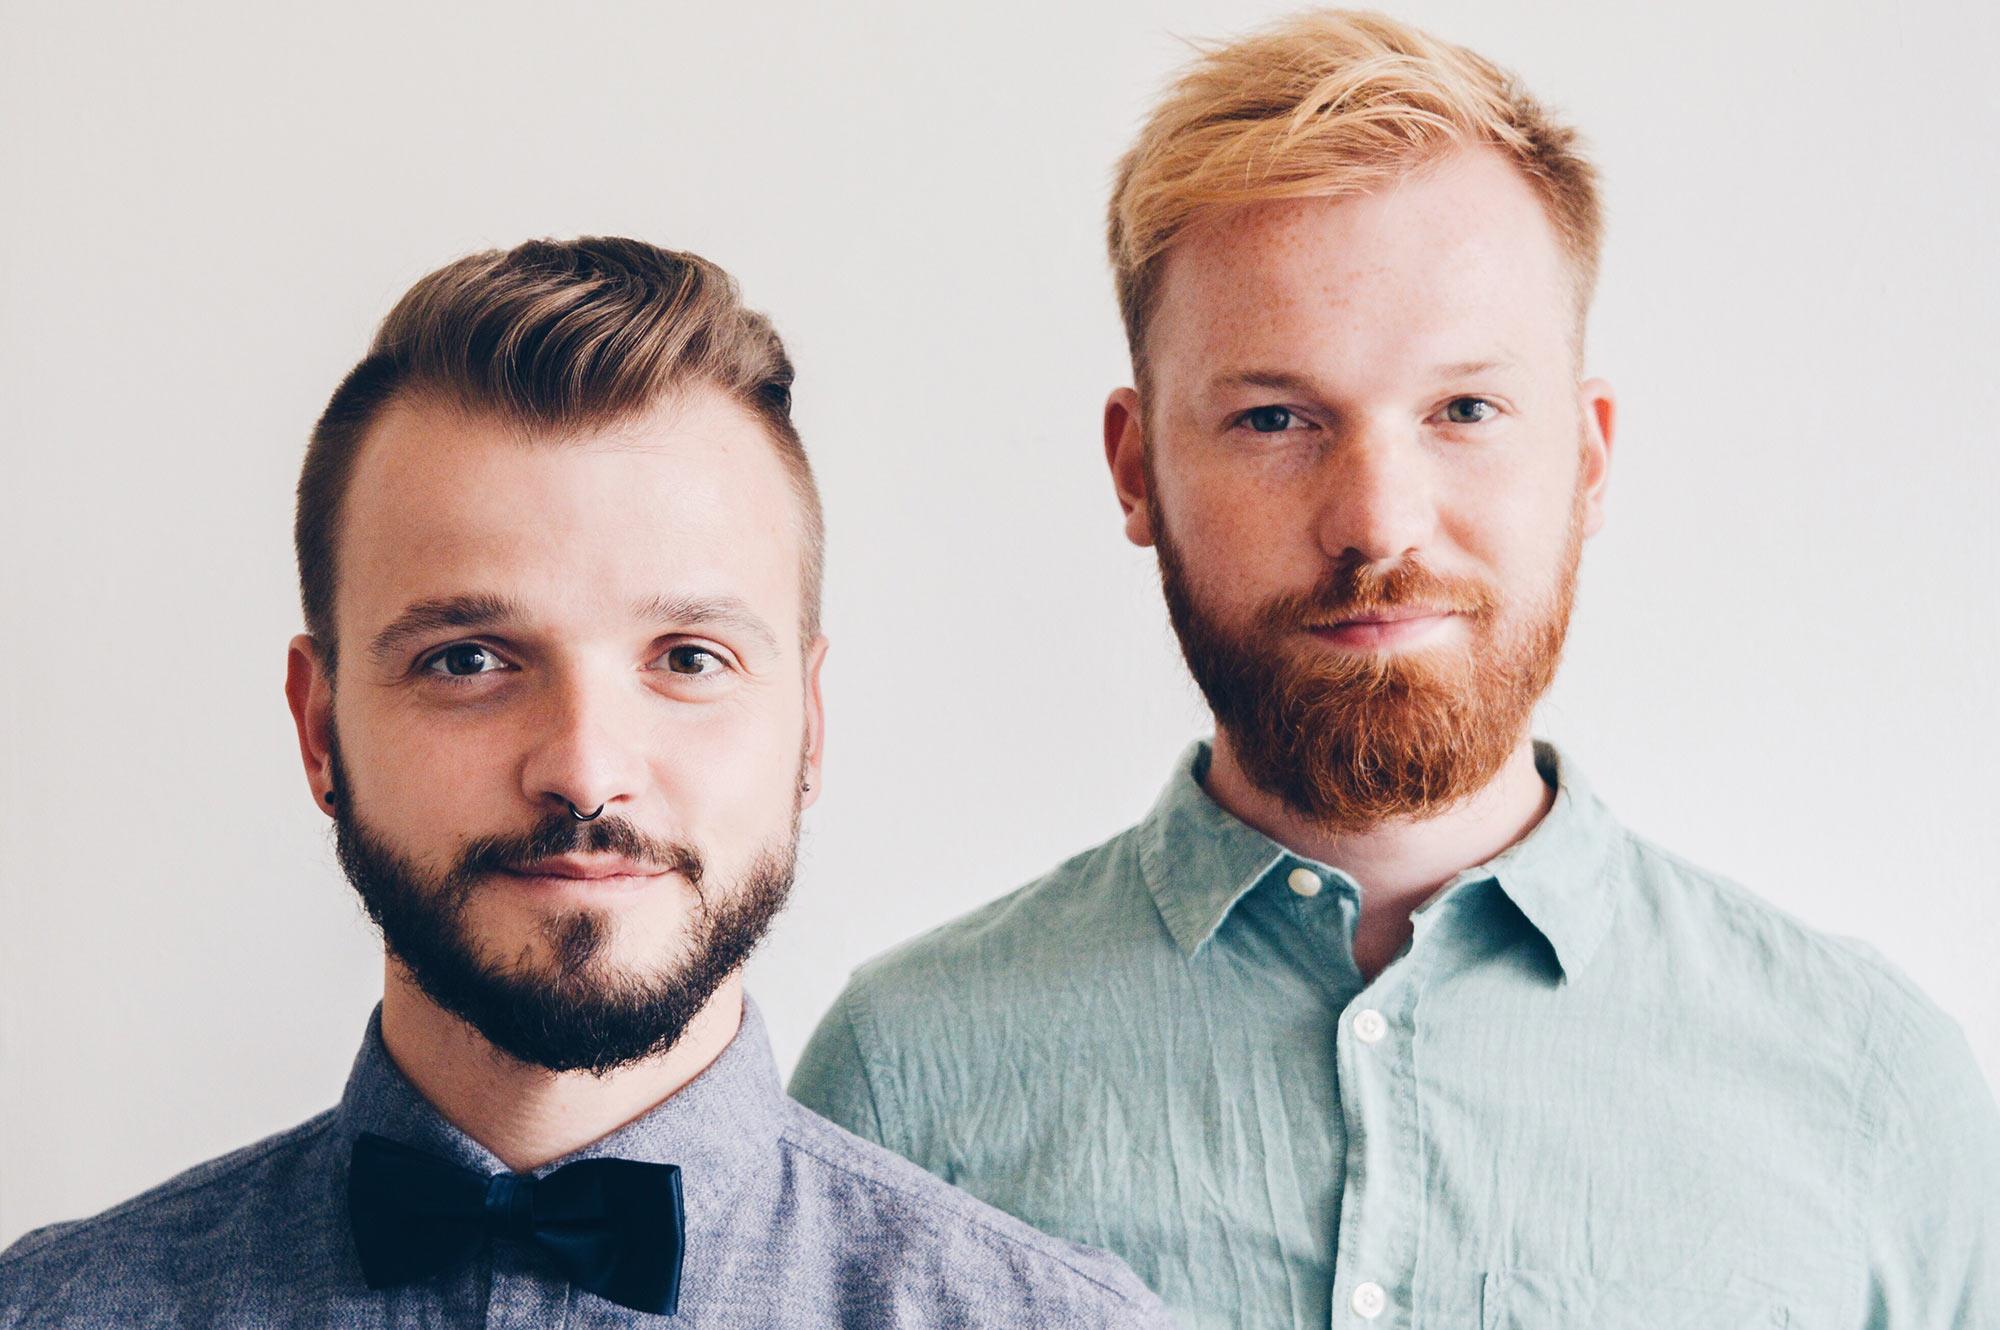 German gay dating sites